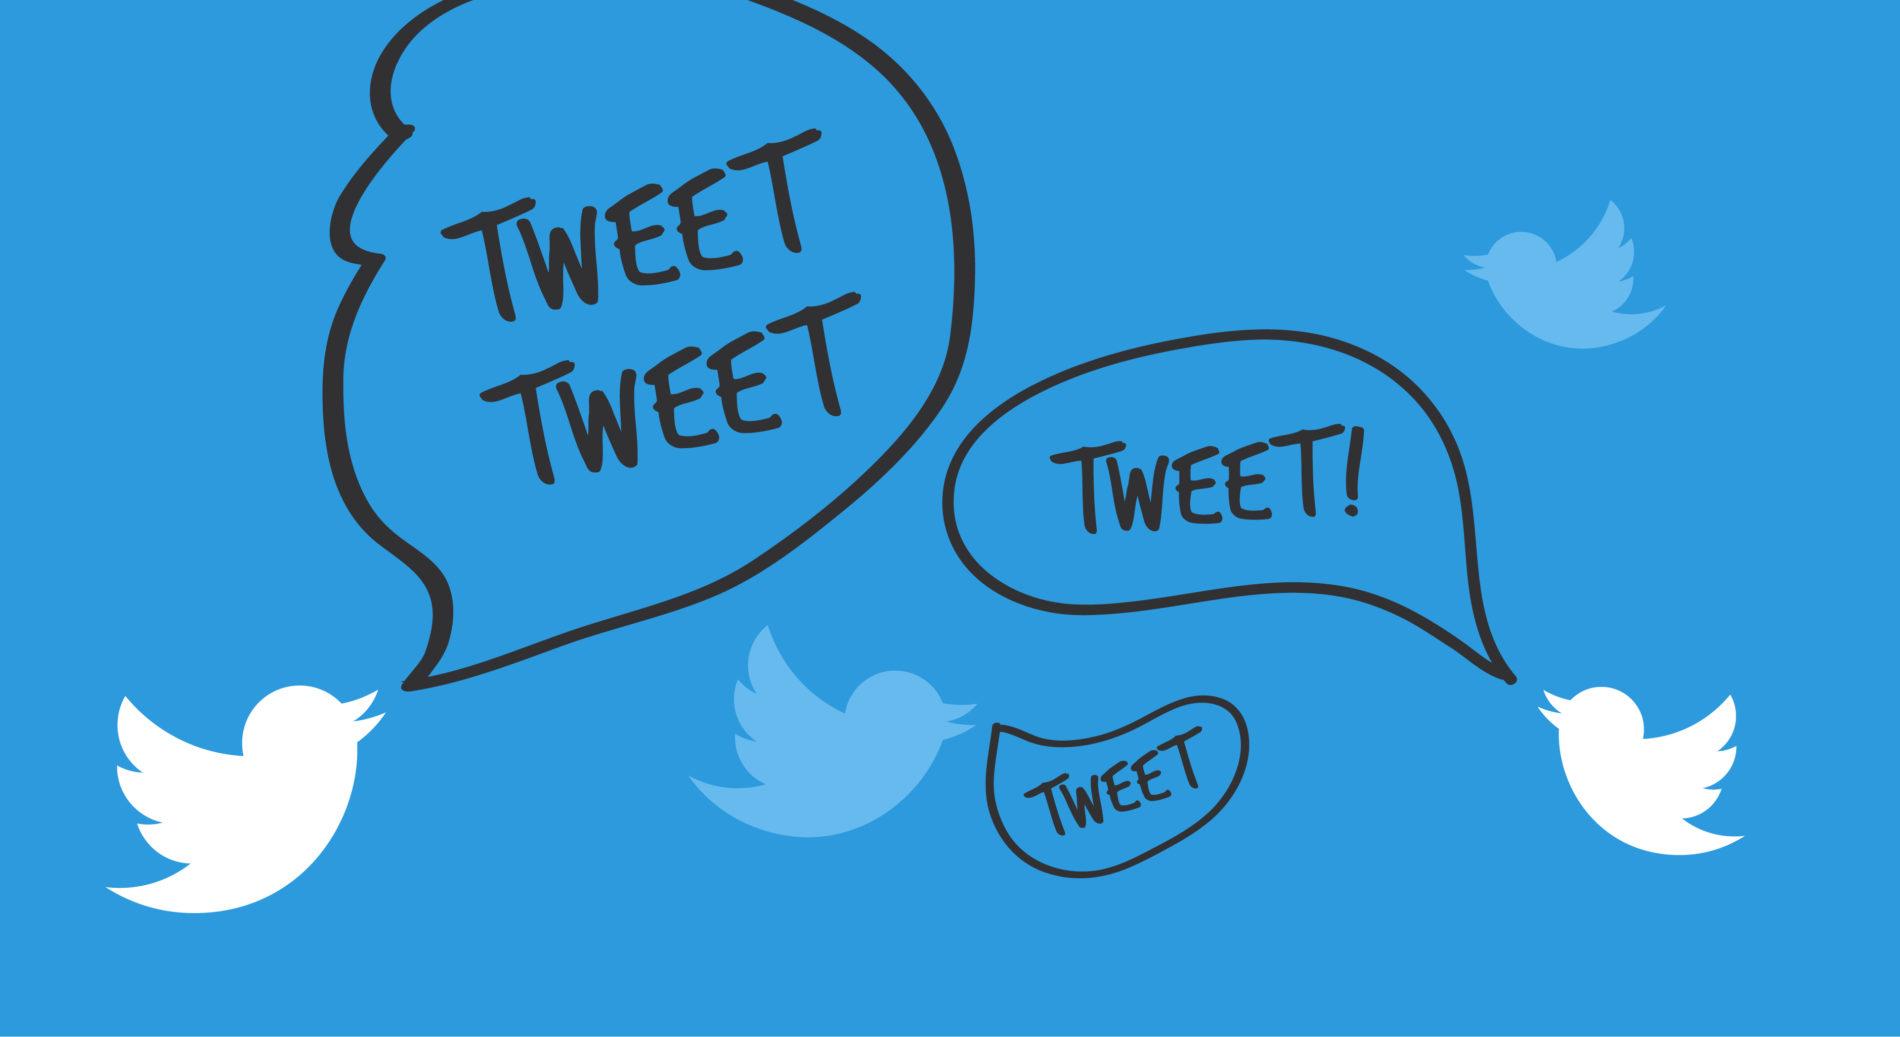 My Life In Tweets